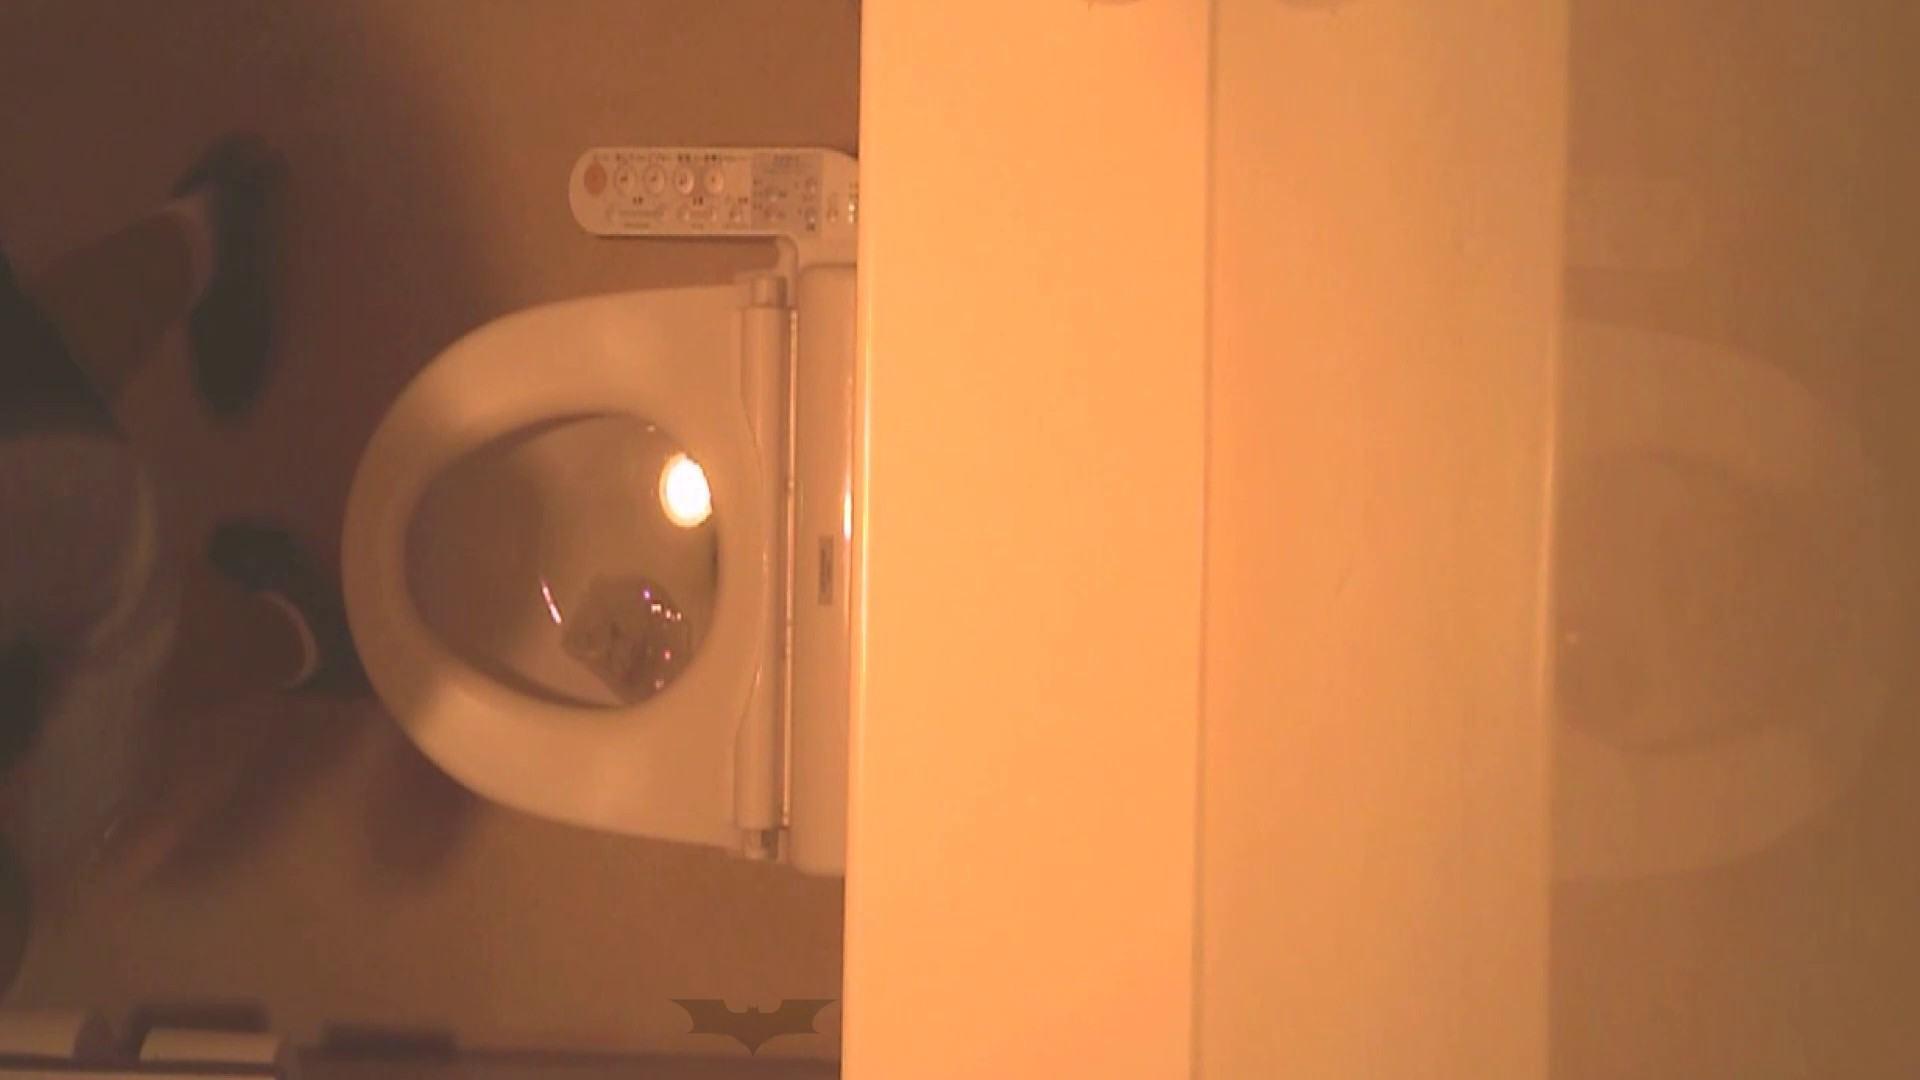 潜入!!全国女子洗面所盗撮 Vol.07 グループ エロ無料画像 80PIX 71